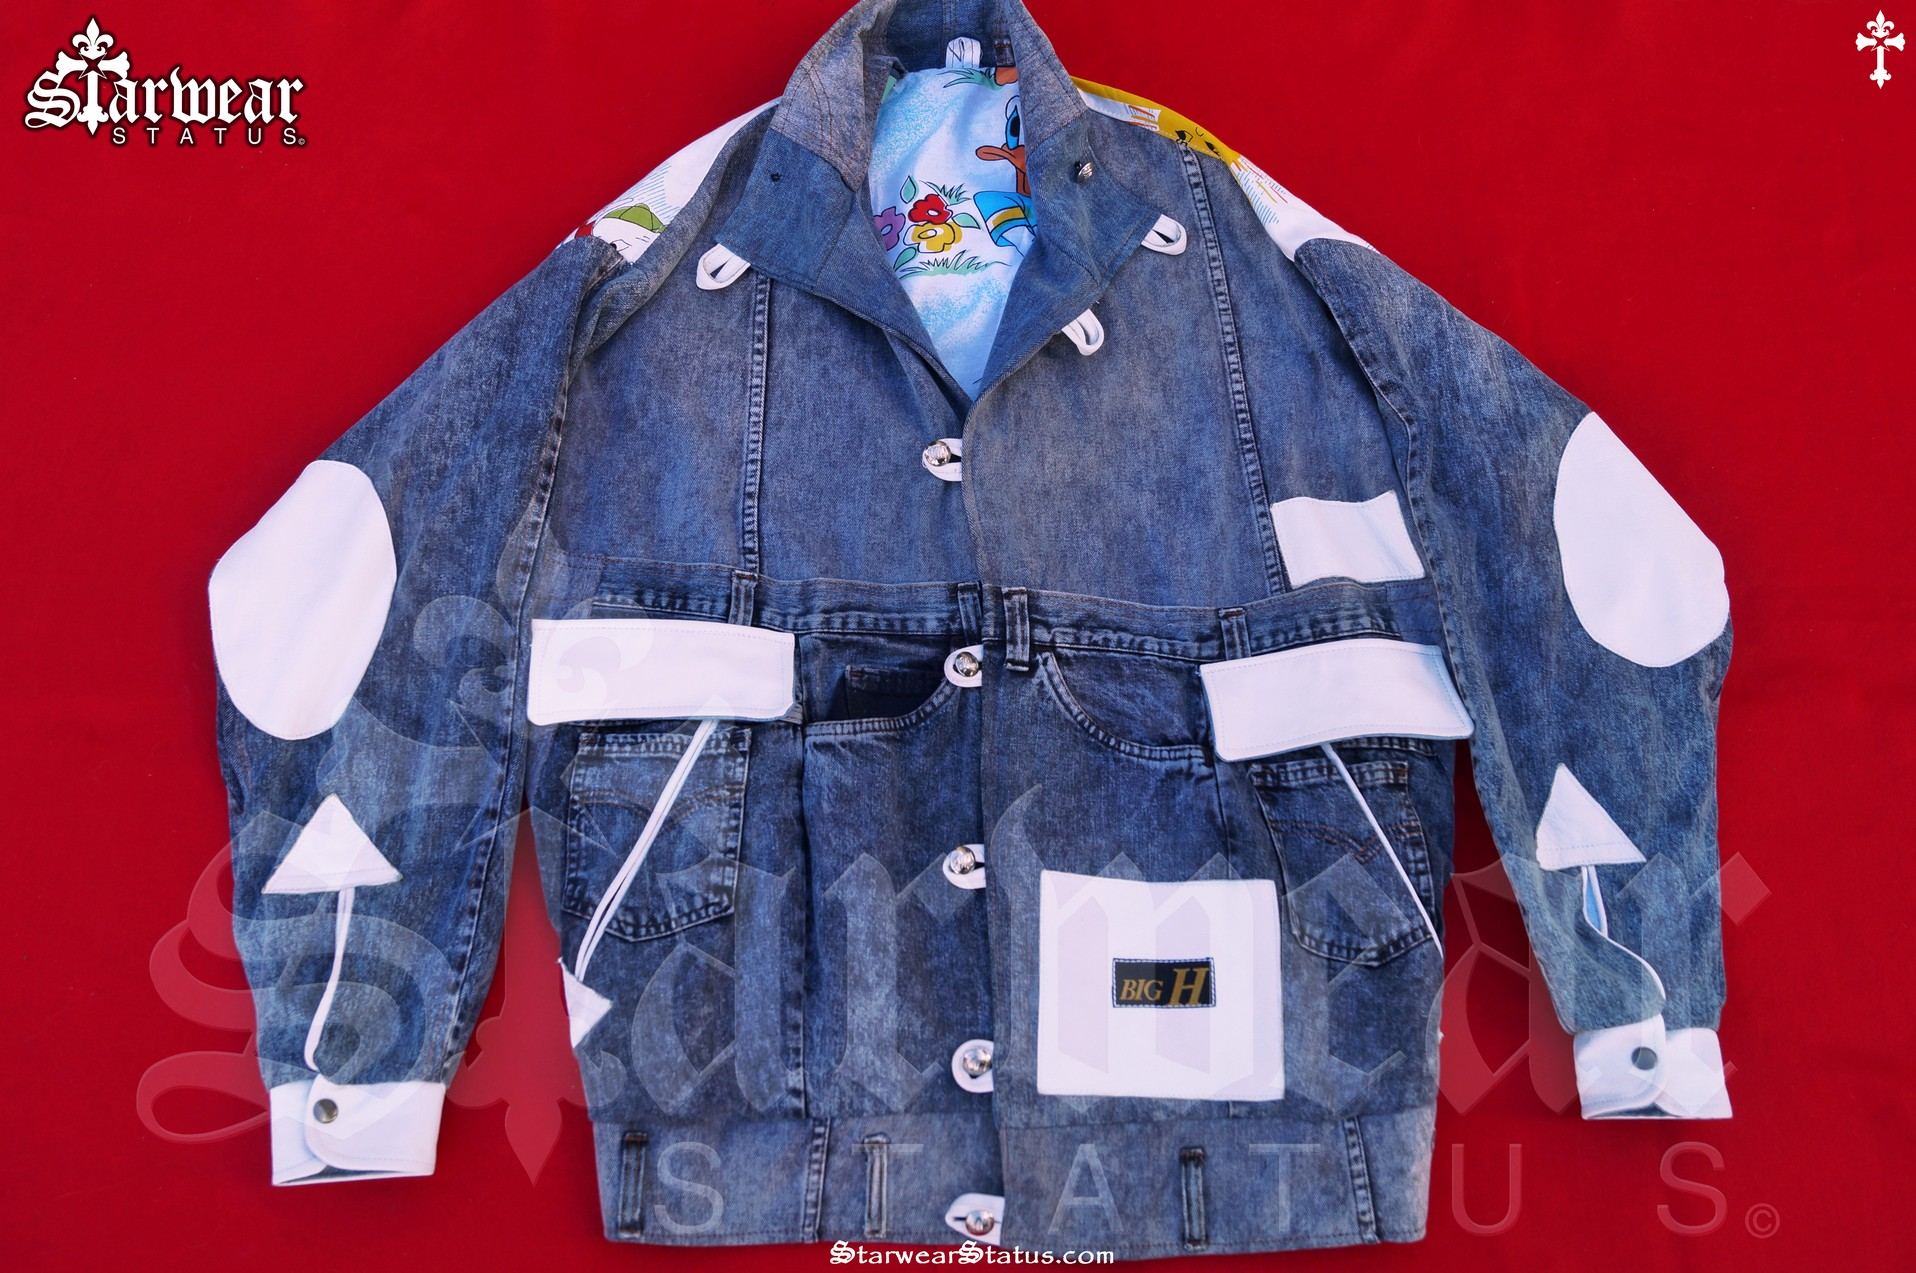 David Hasselhoff Owned Walt Disney Leather Detail Denim Jacket Ft